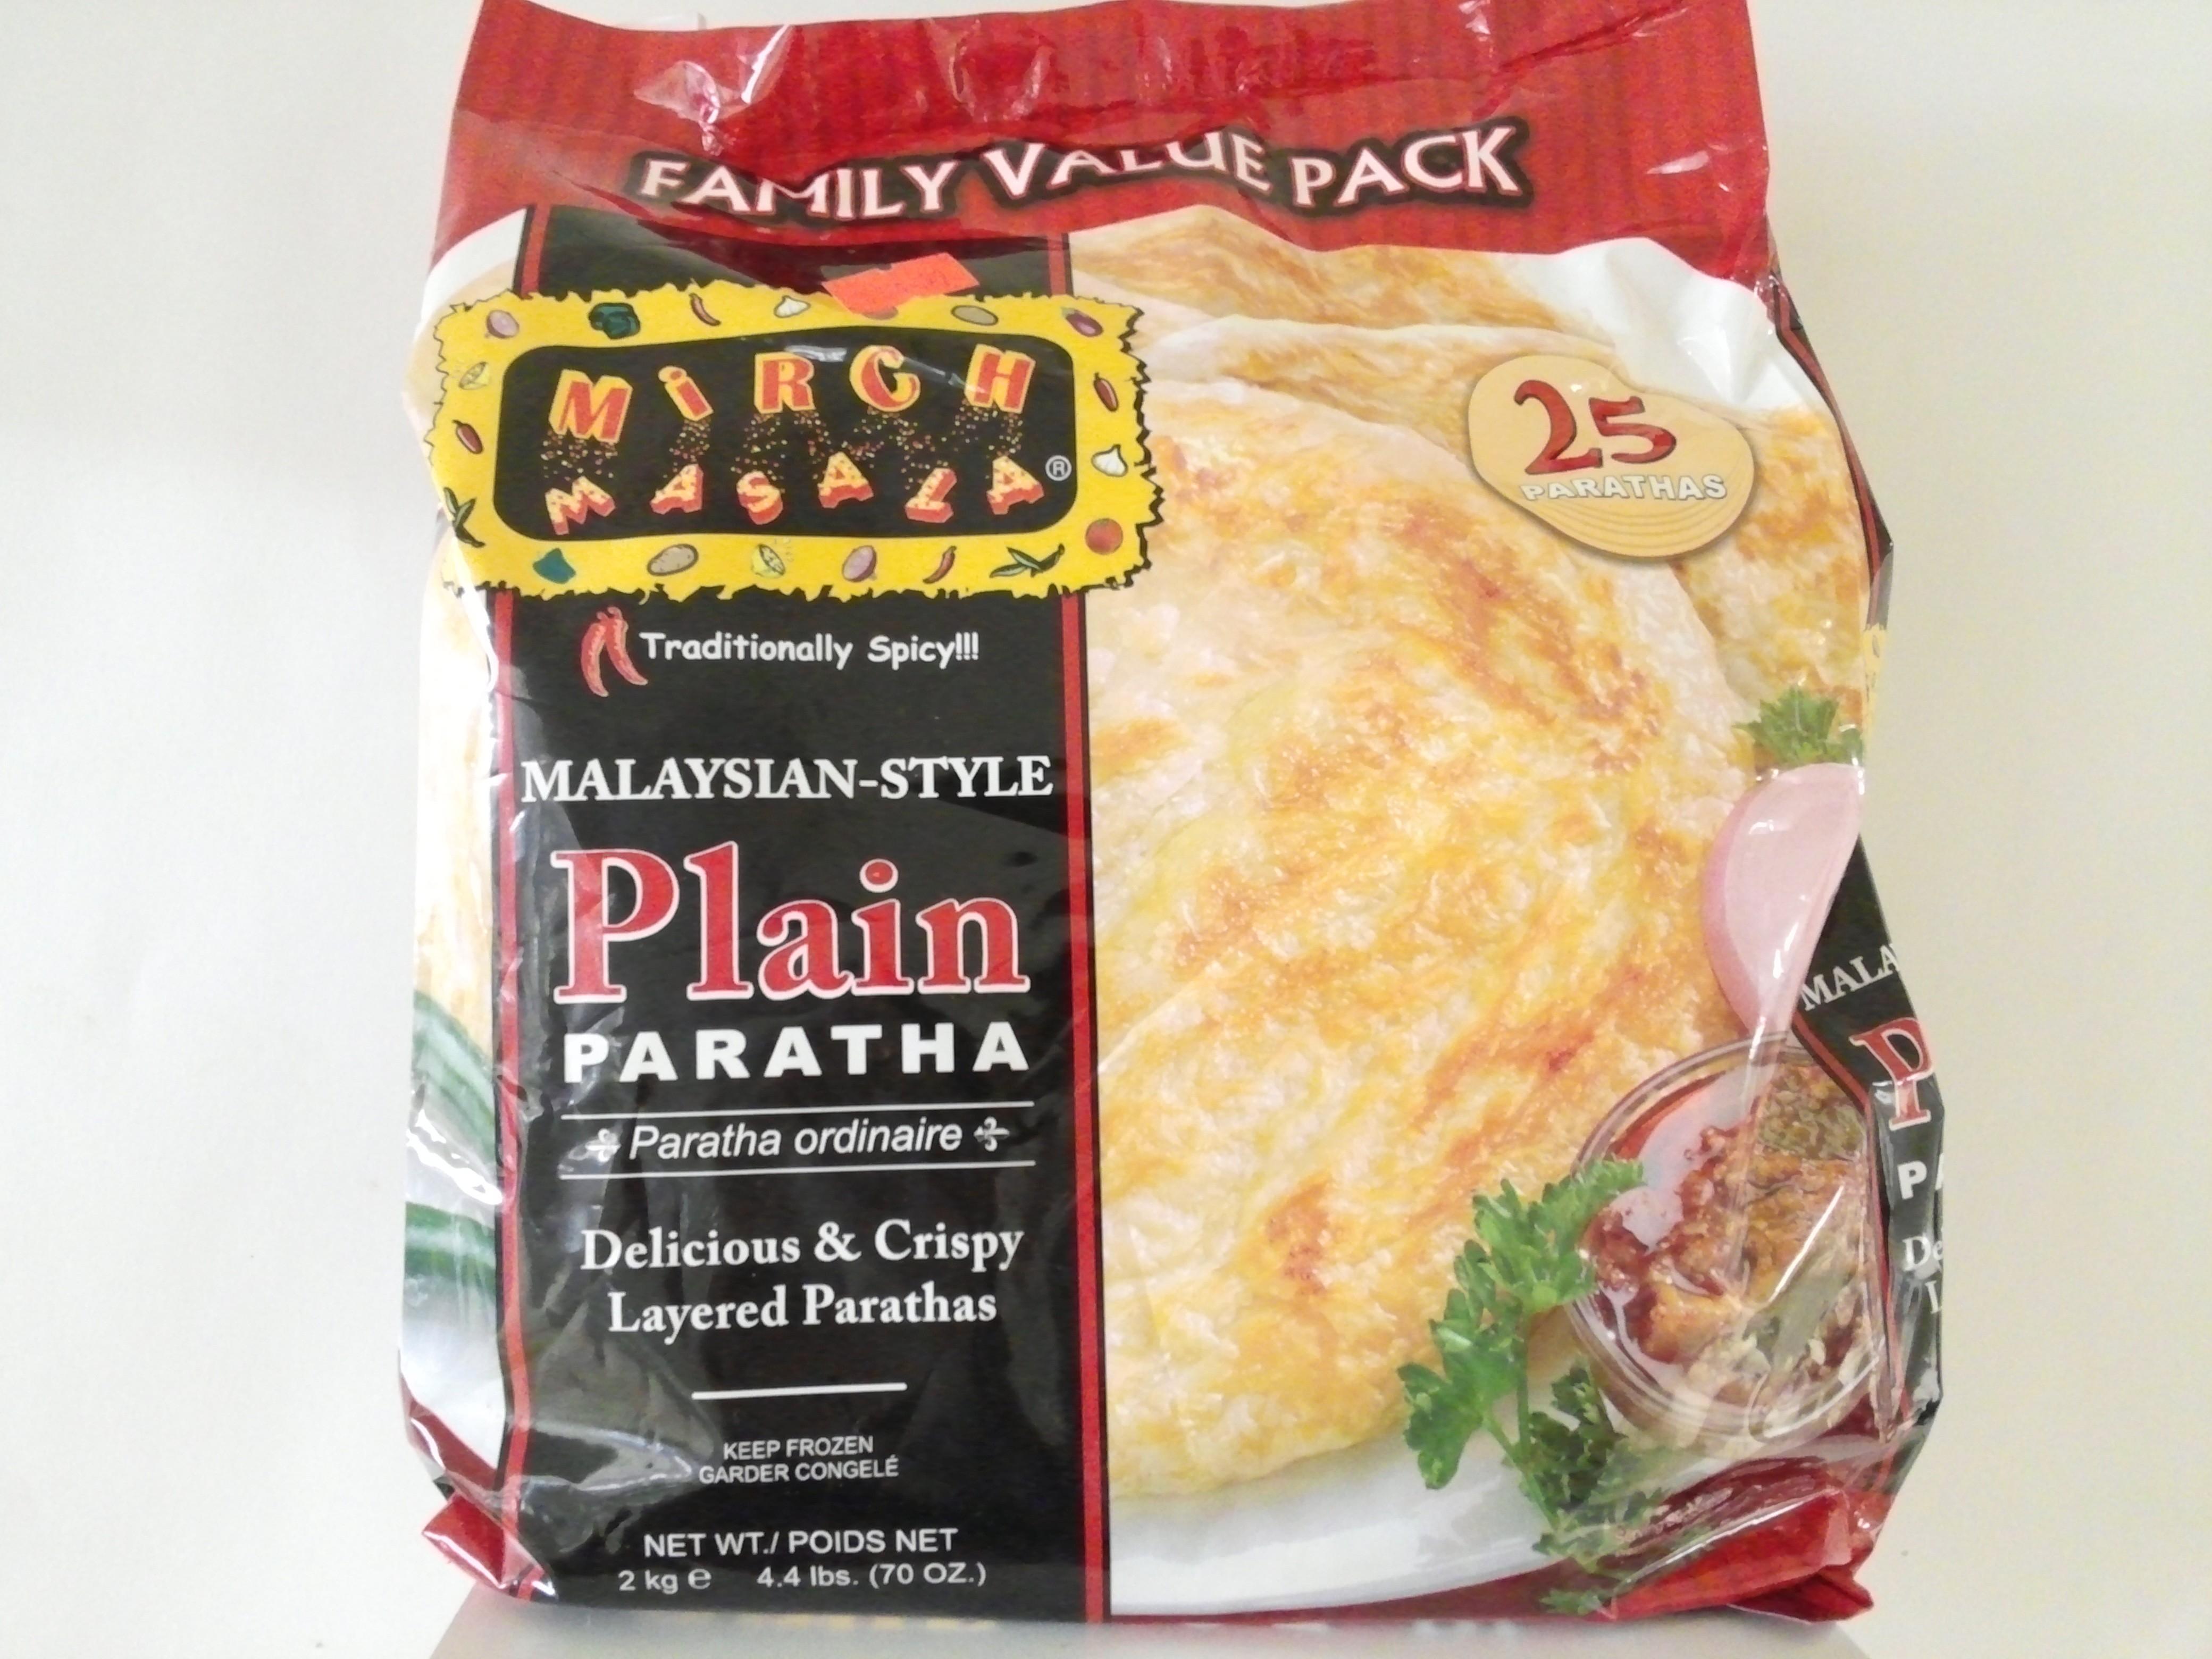 Mirch Masala Plain Paratha (Value Pack) 25 Pcs 70 oz